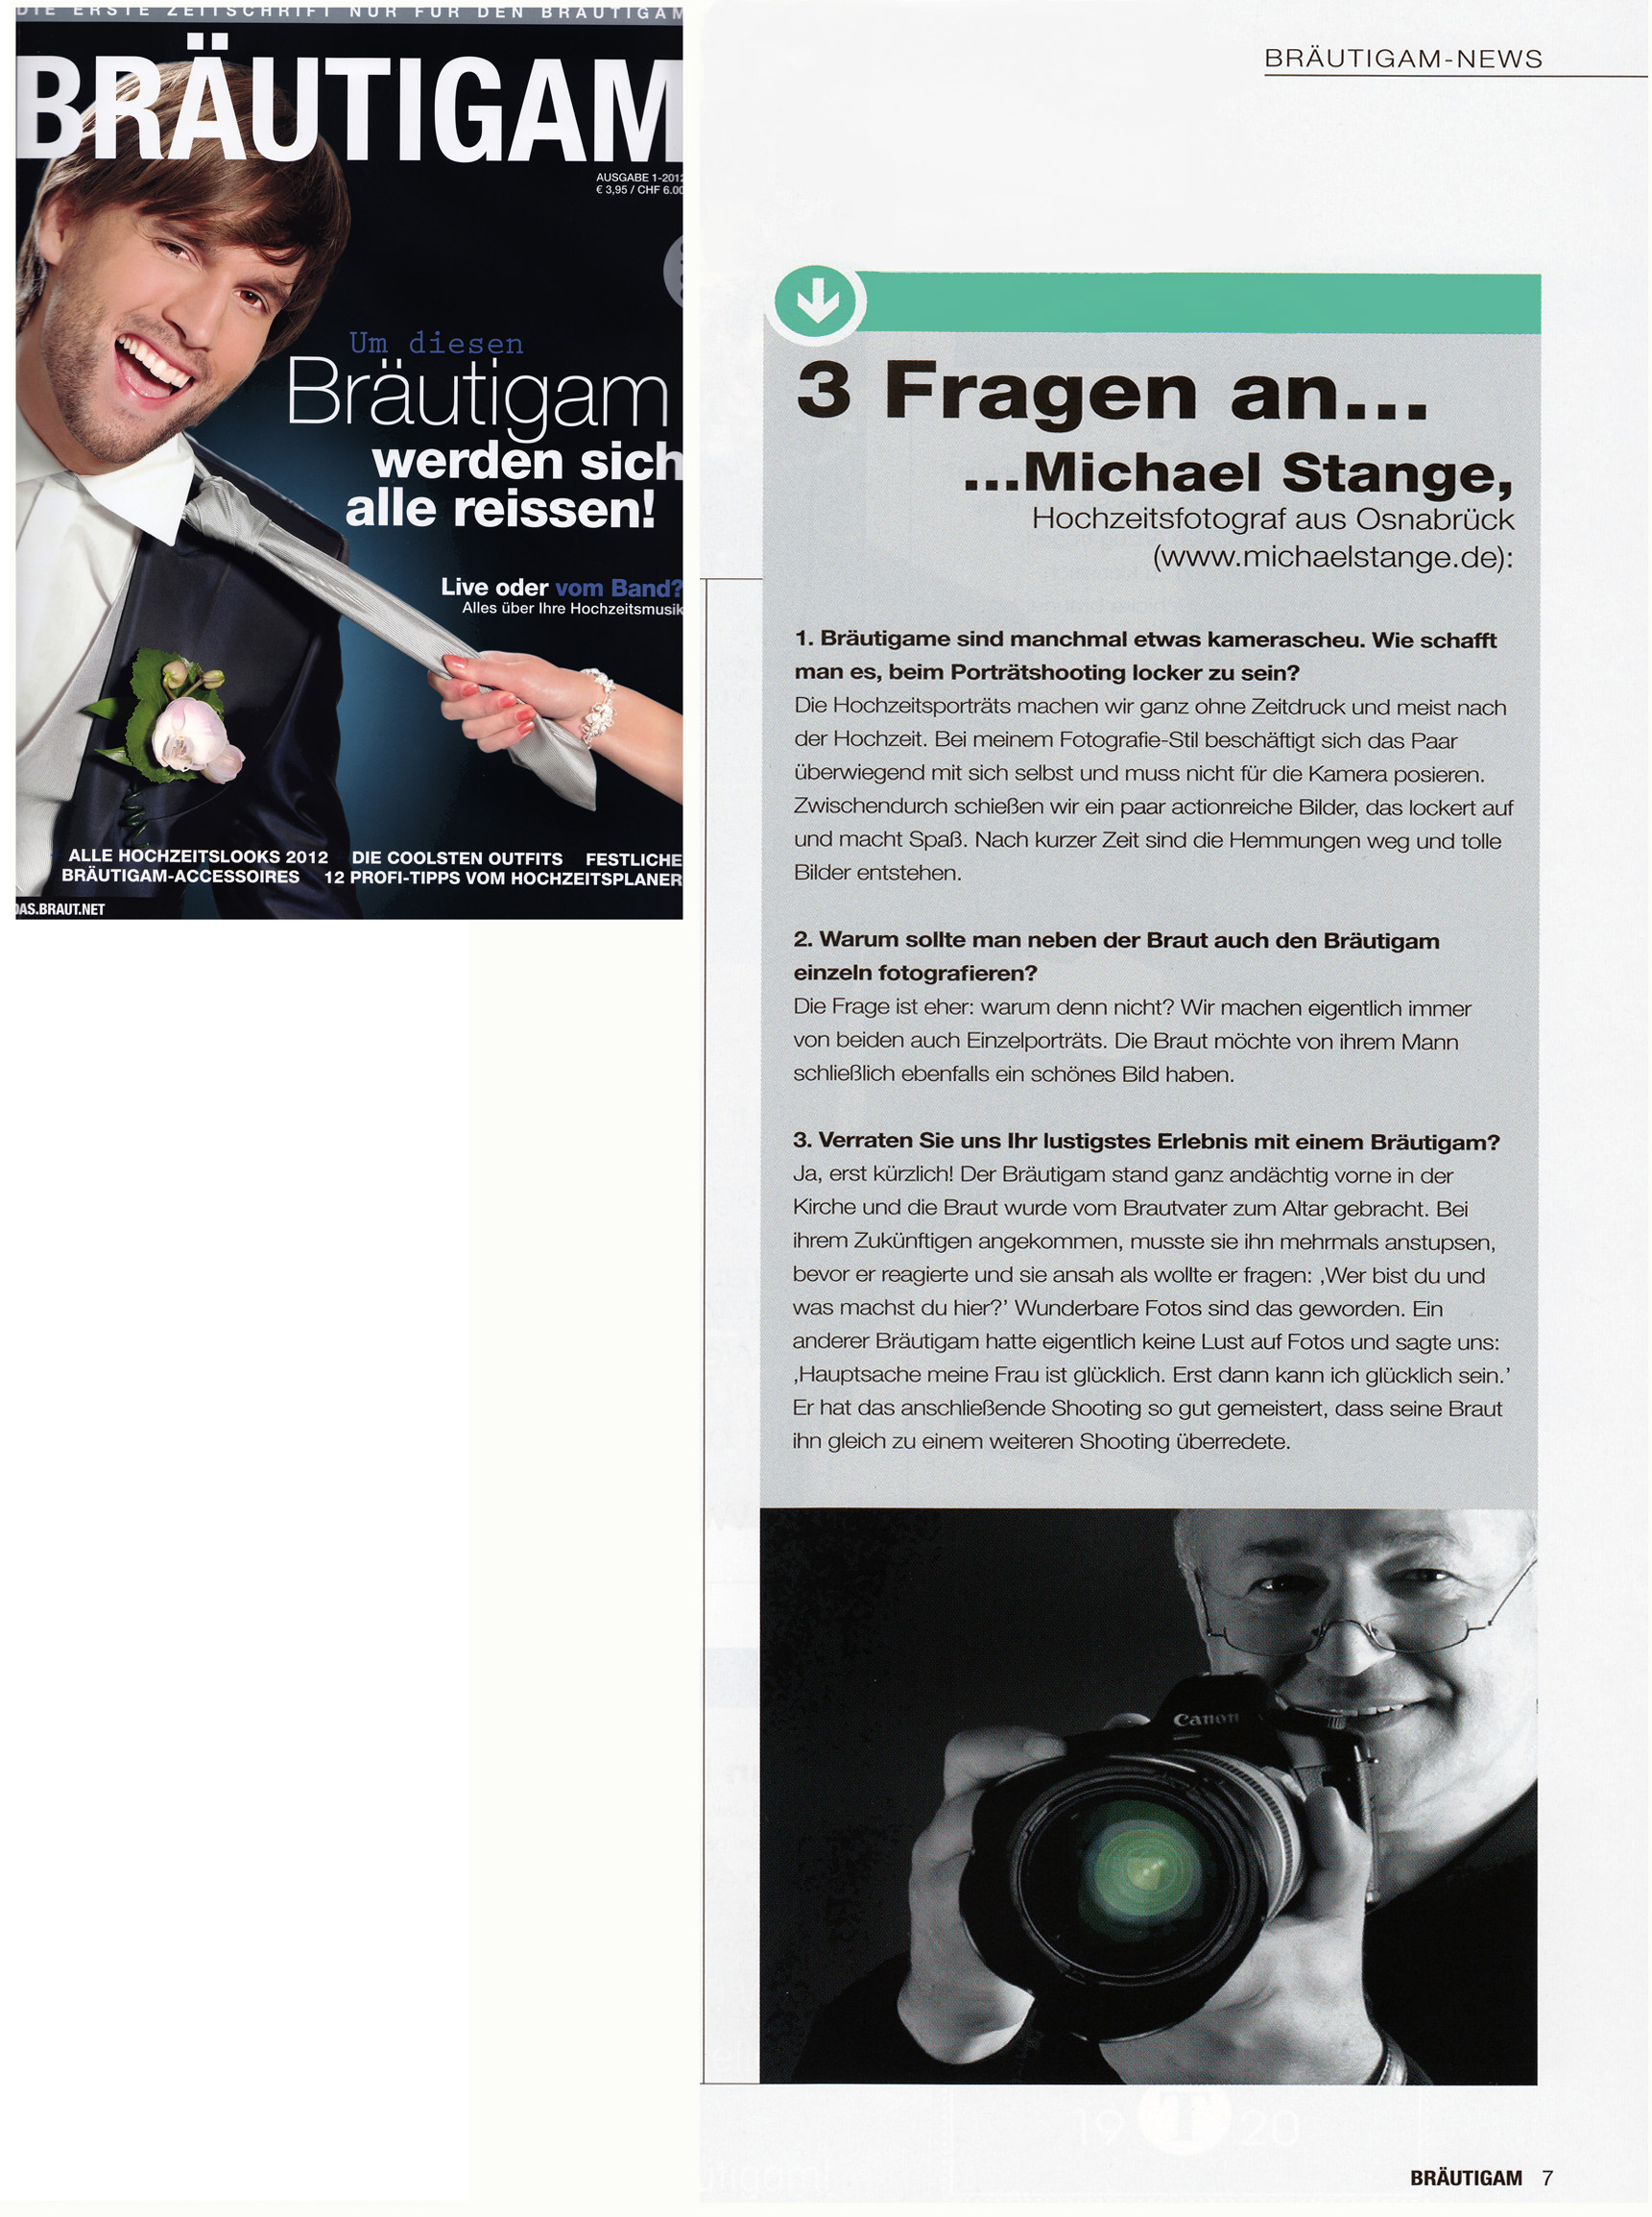 Bräutigam-magazin